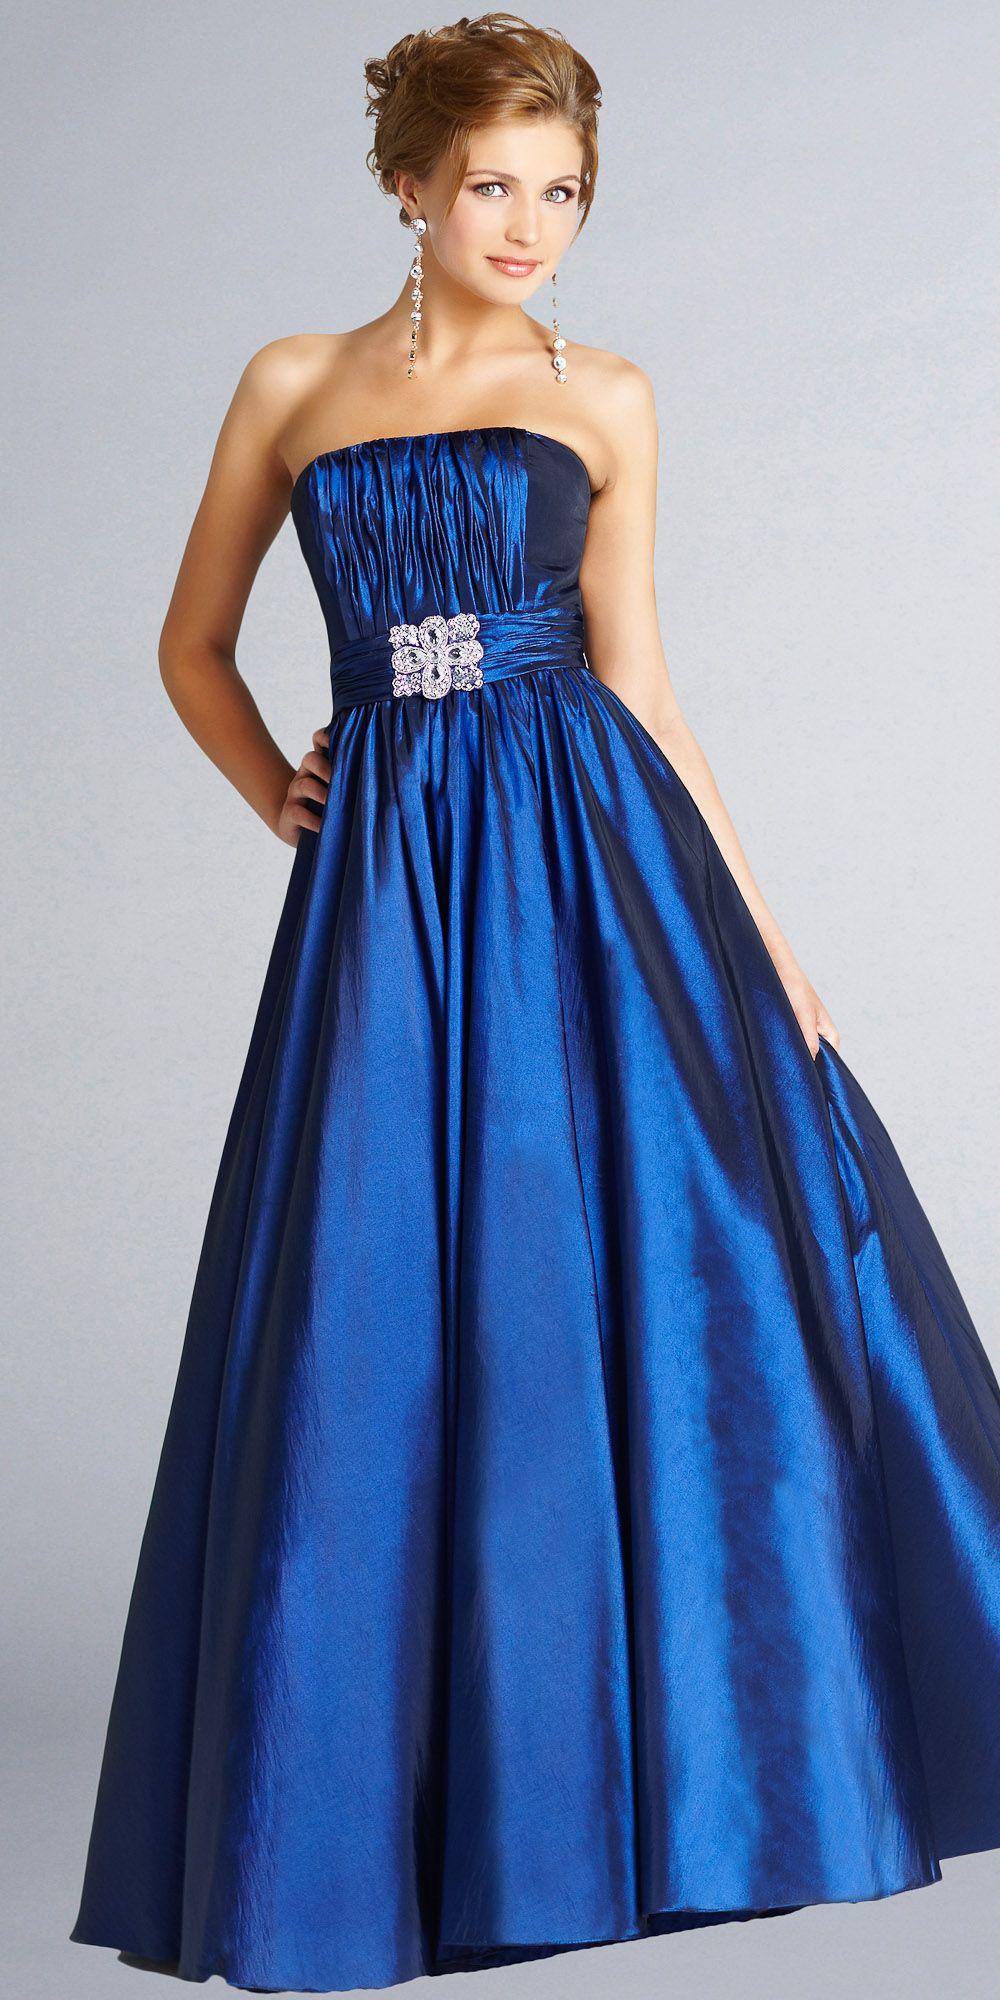 Vestidos de noche color azul turquesa - Azul Electrico Color Buscar Con Google